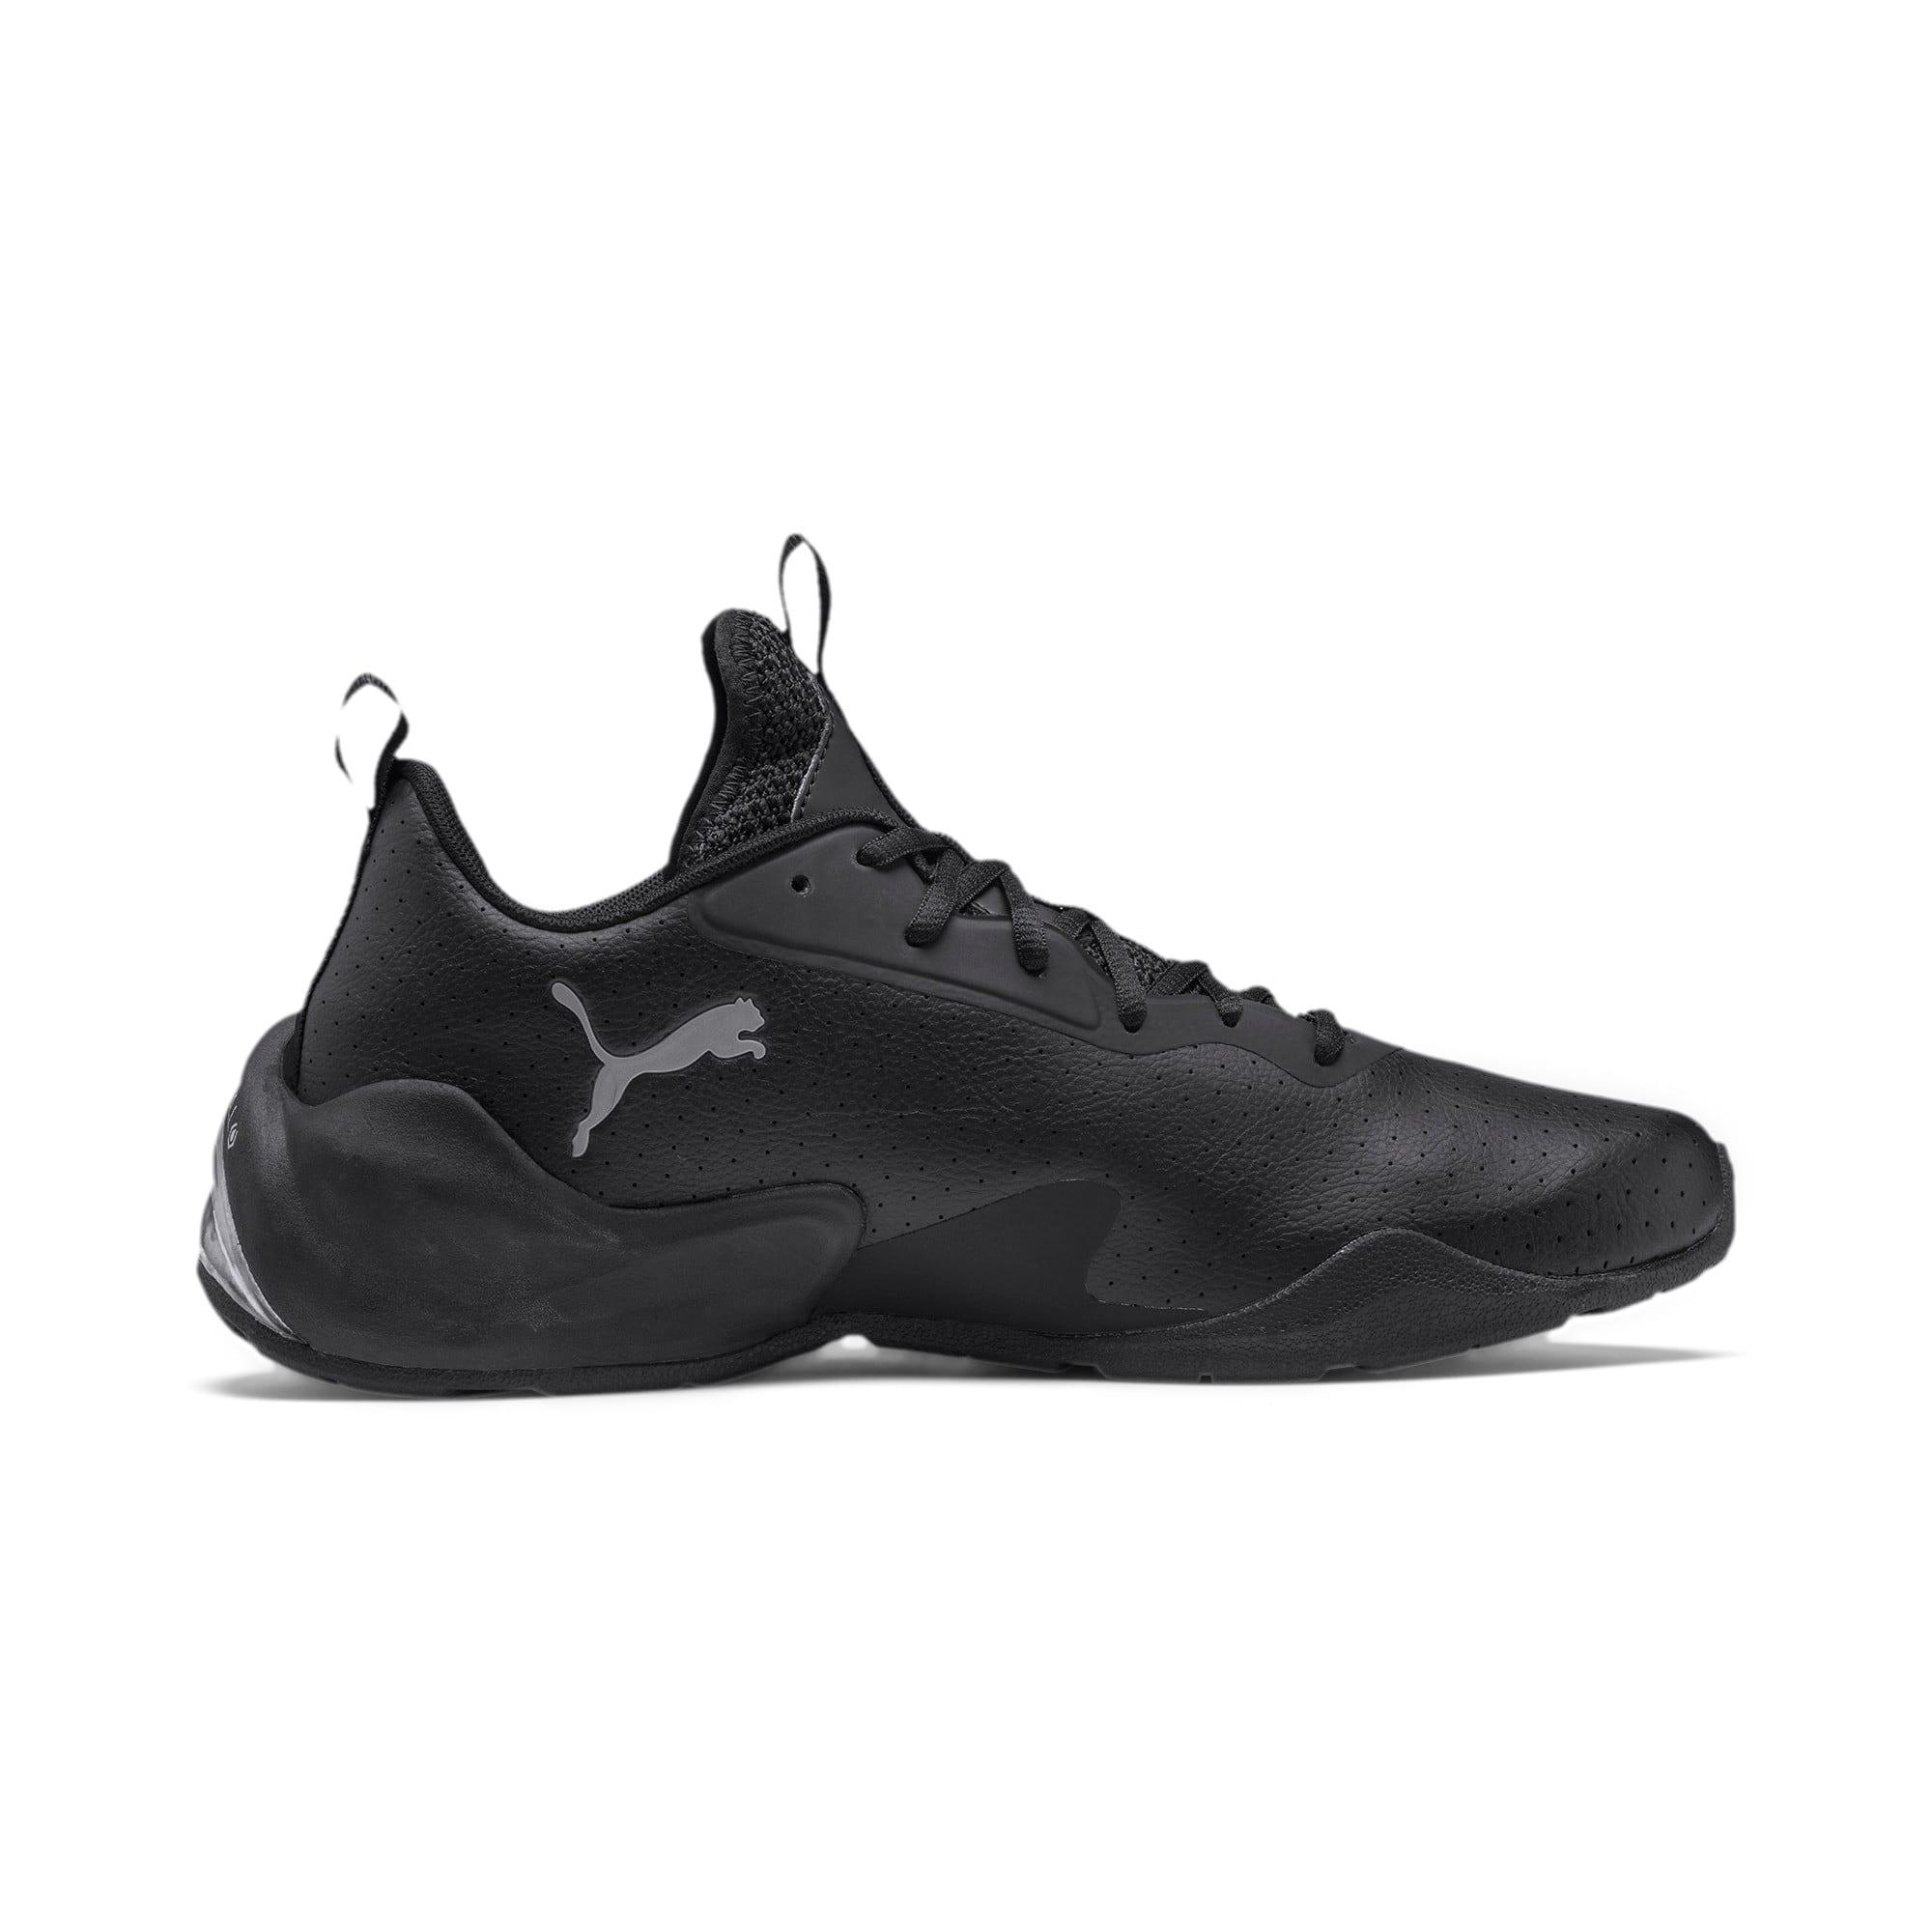 Thumbnail 6 of LQDCELL Challenge Perf Men's Training Shoes, Puma Black-CASTLEROCK, medium